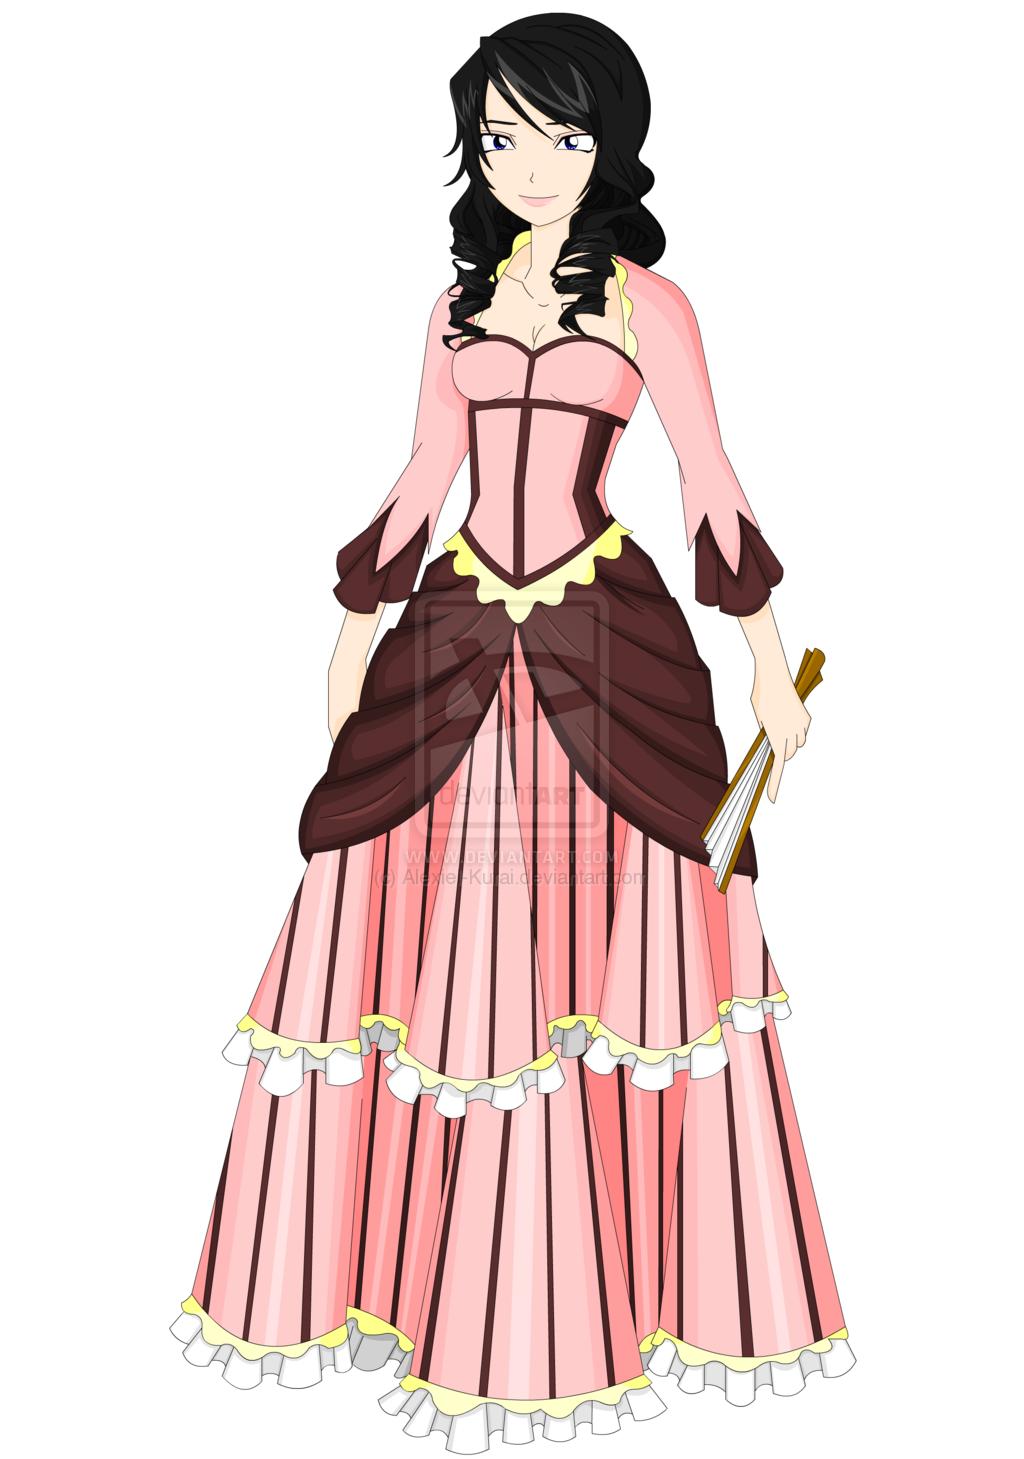 Anime Victorian Dresses - Pesquisa Google | De U00e9poca | Pinterest | Dresses Search And Victorian